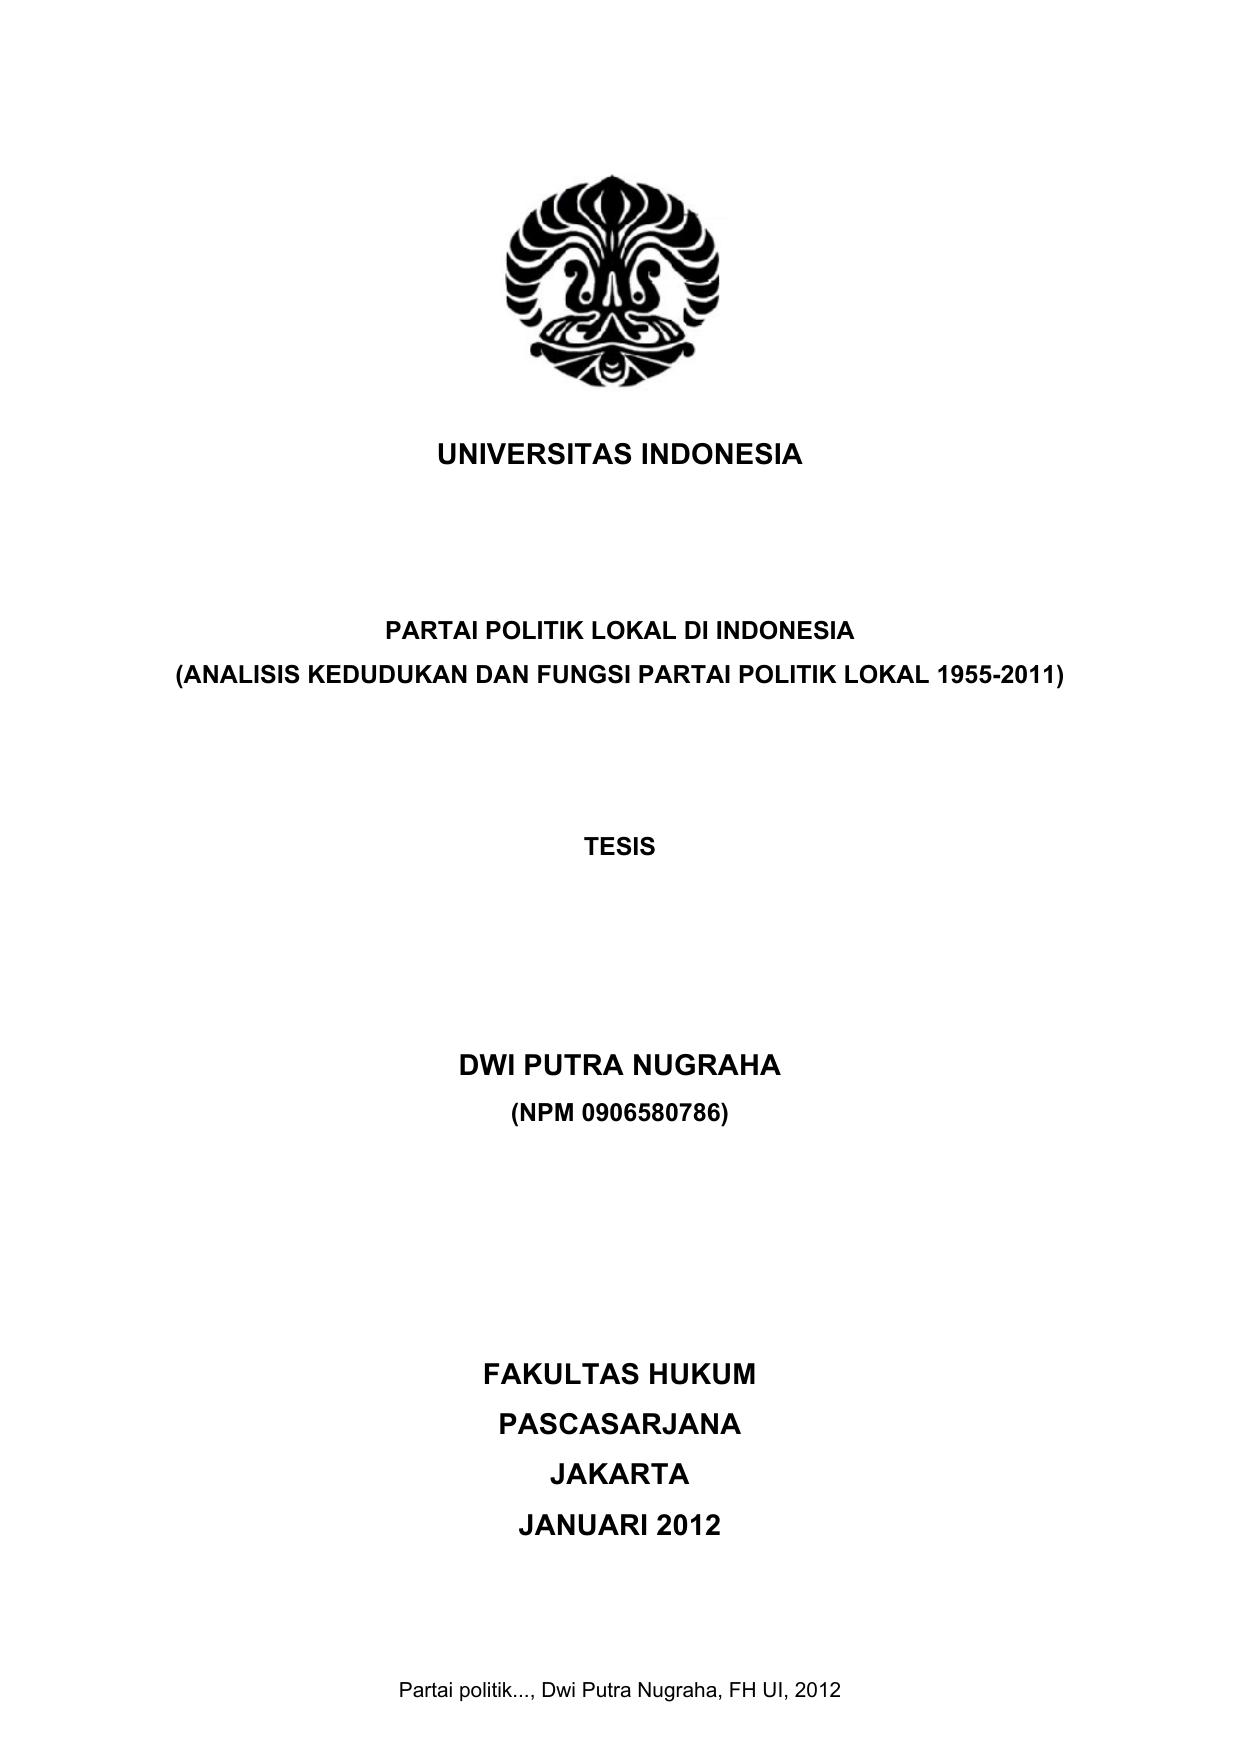 Partai Politik Perpustakaan Universitas Indonesia